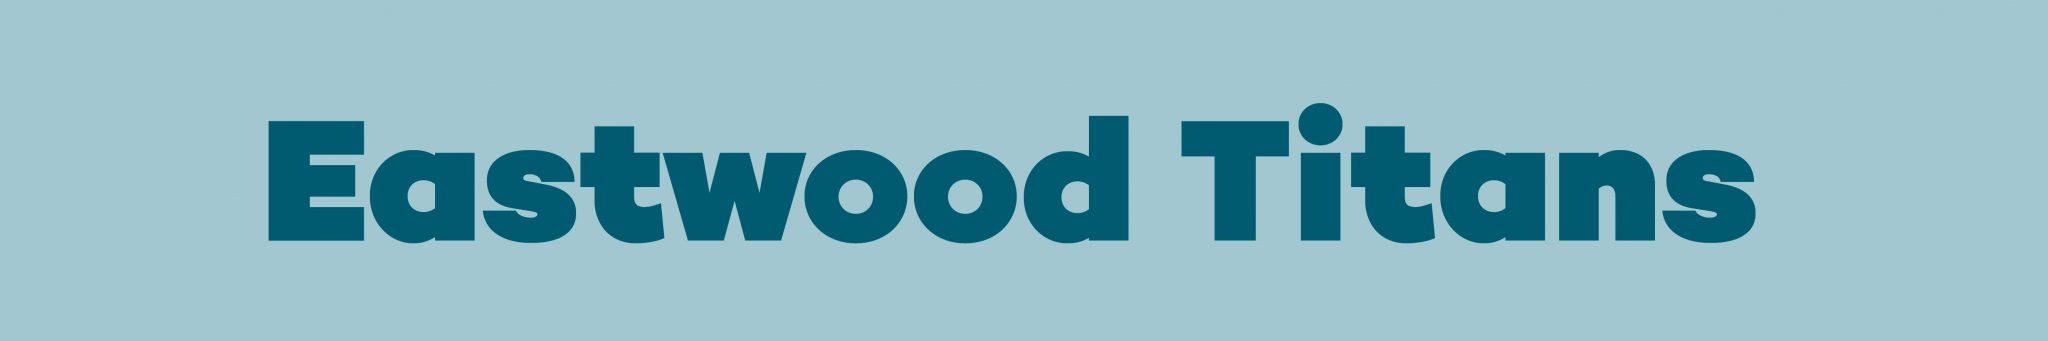 eastwood titans logo